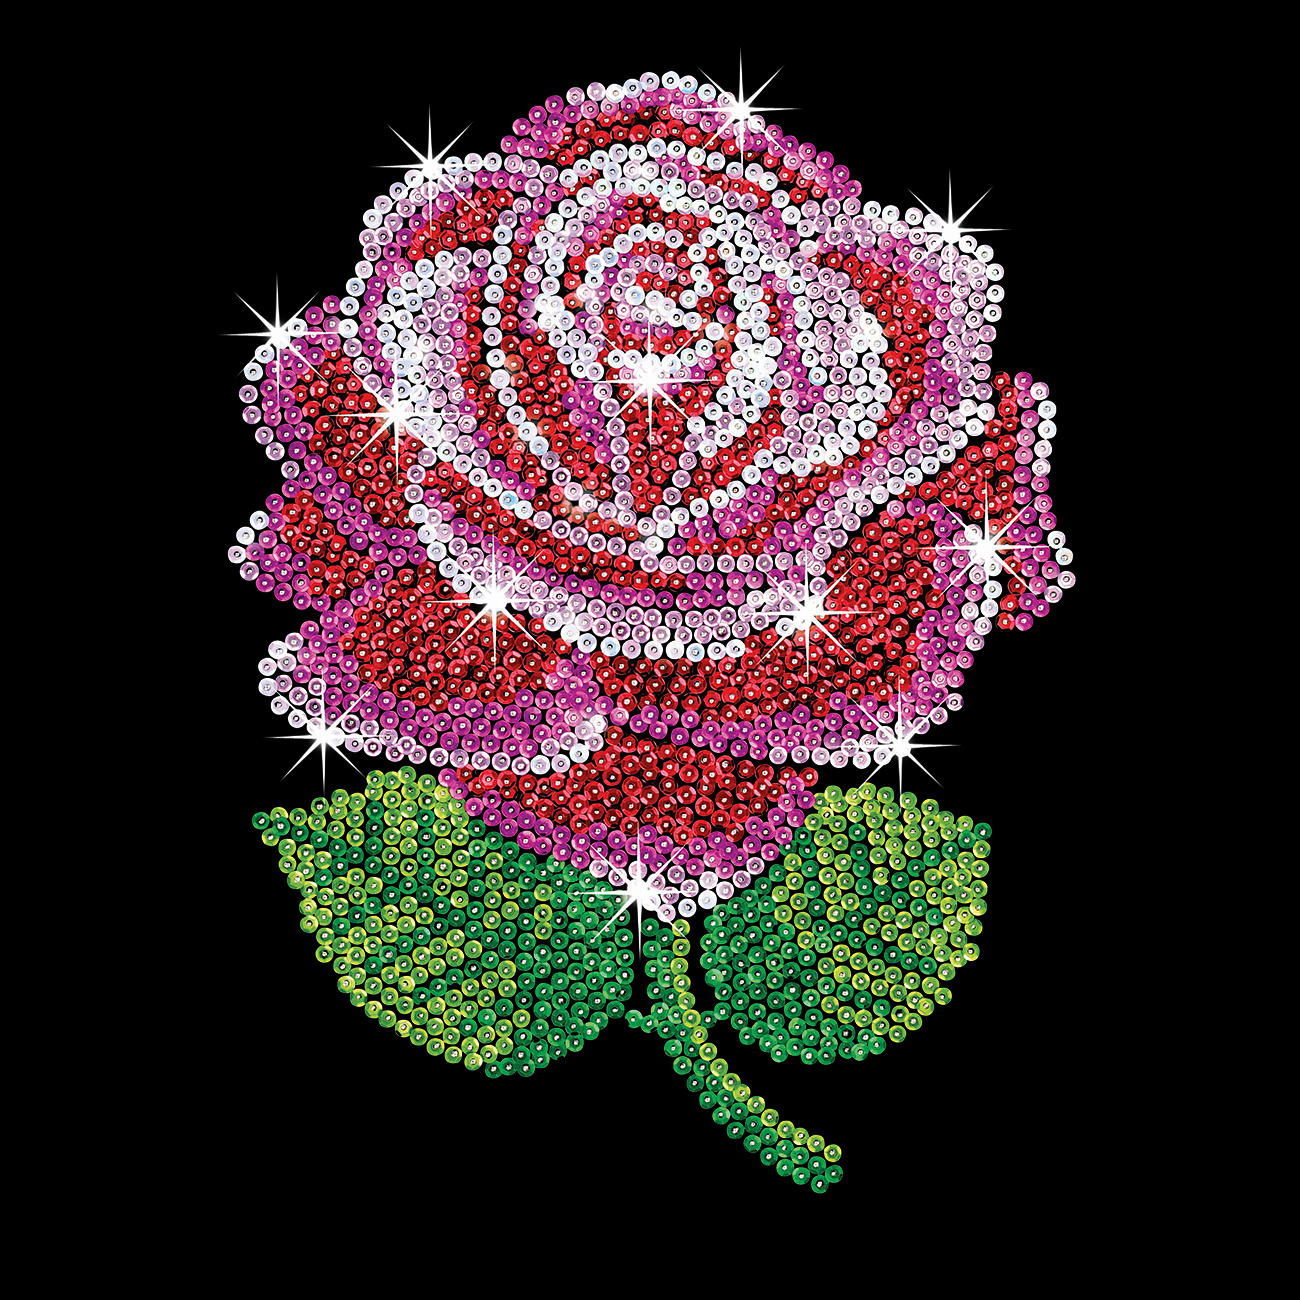 paillettenbild f r erwachsene rote rose. Black Bedroom Furniture Sets. Home Design Ideas